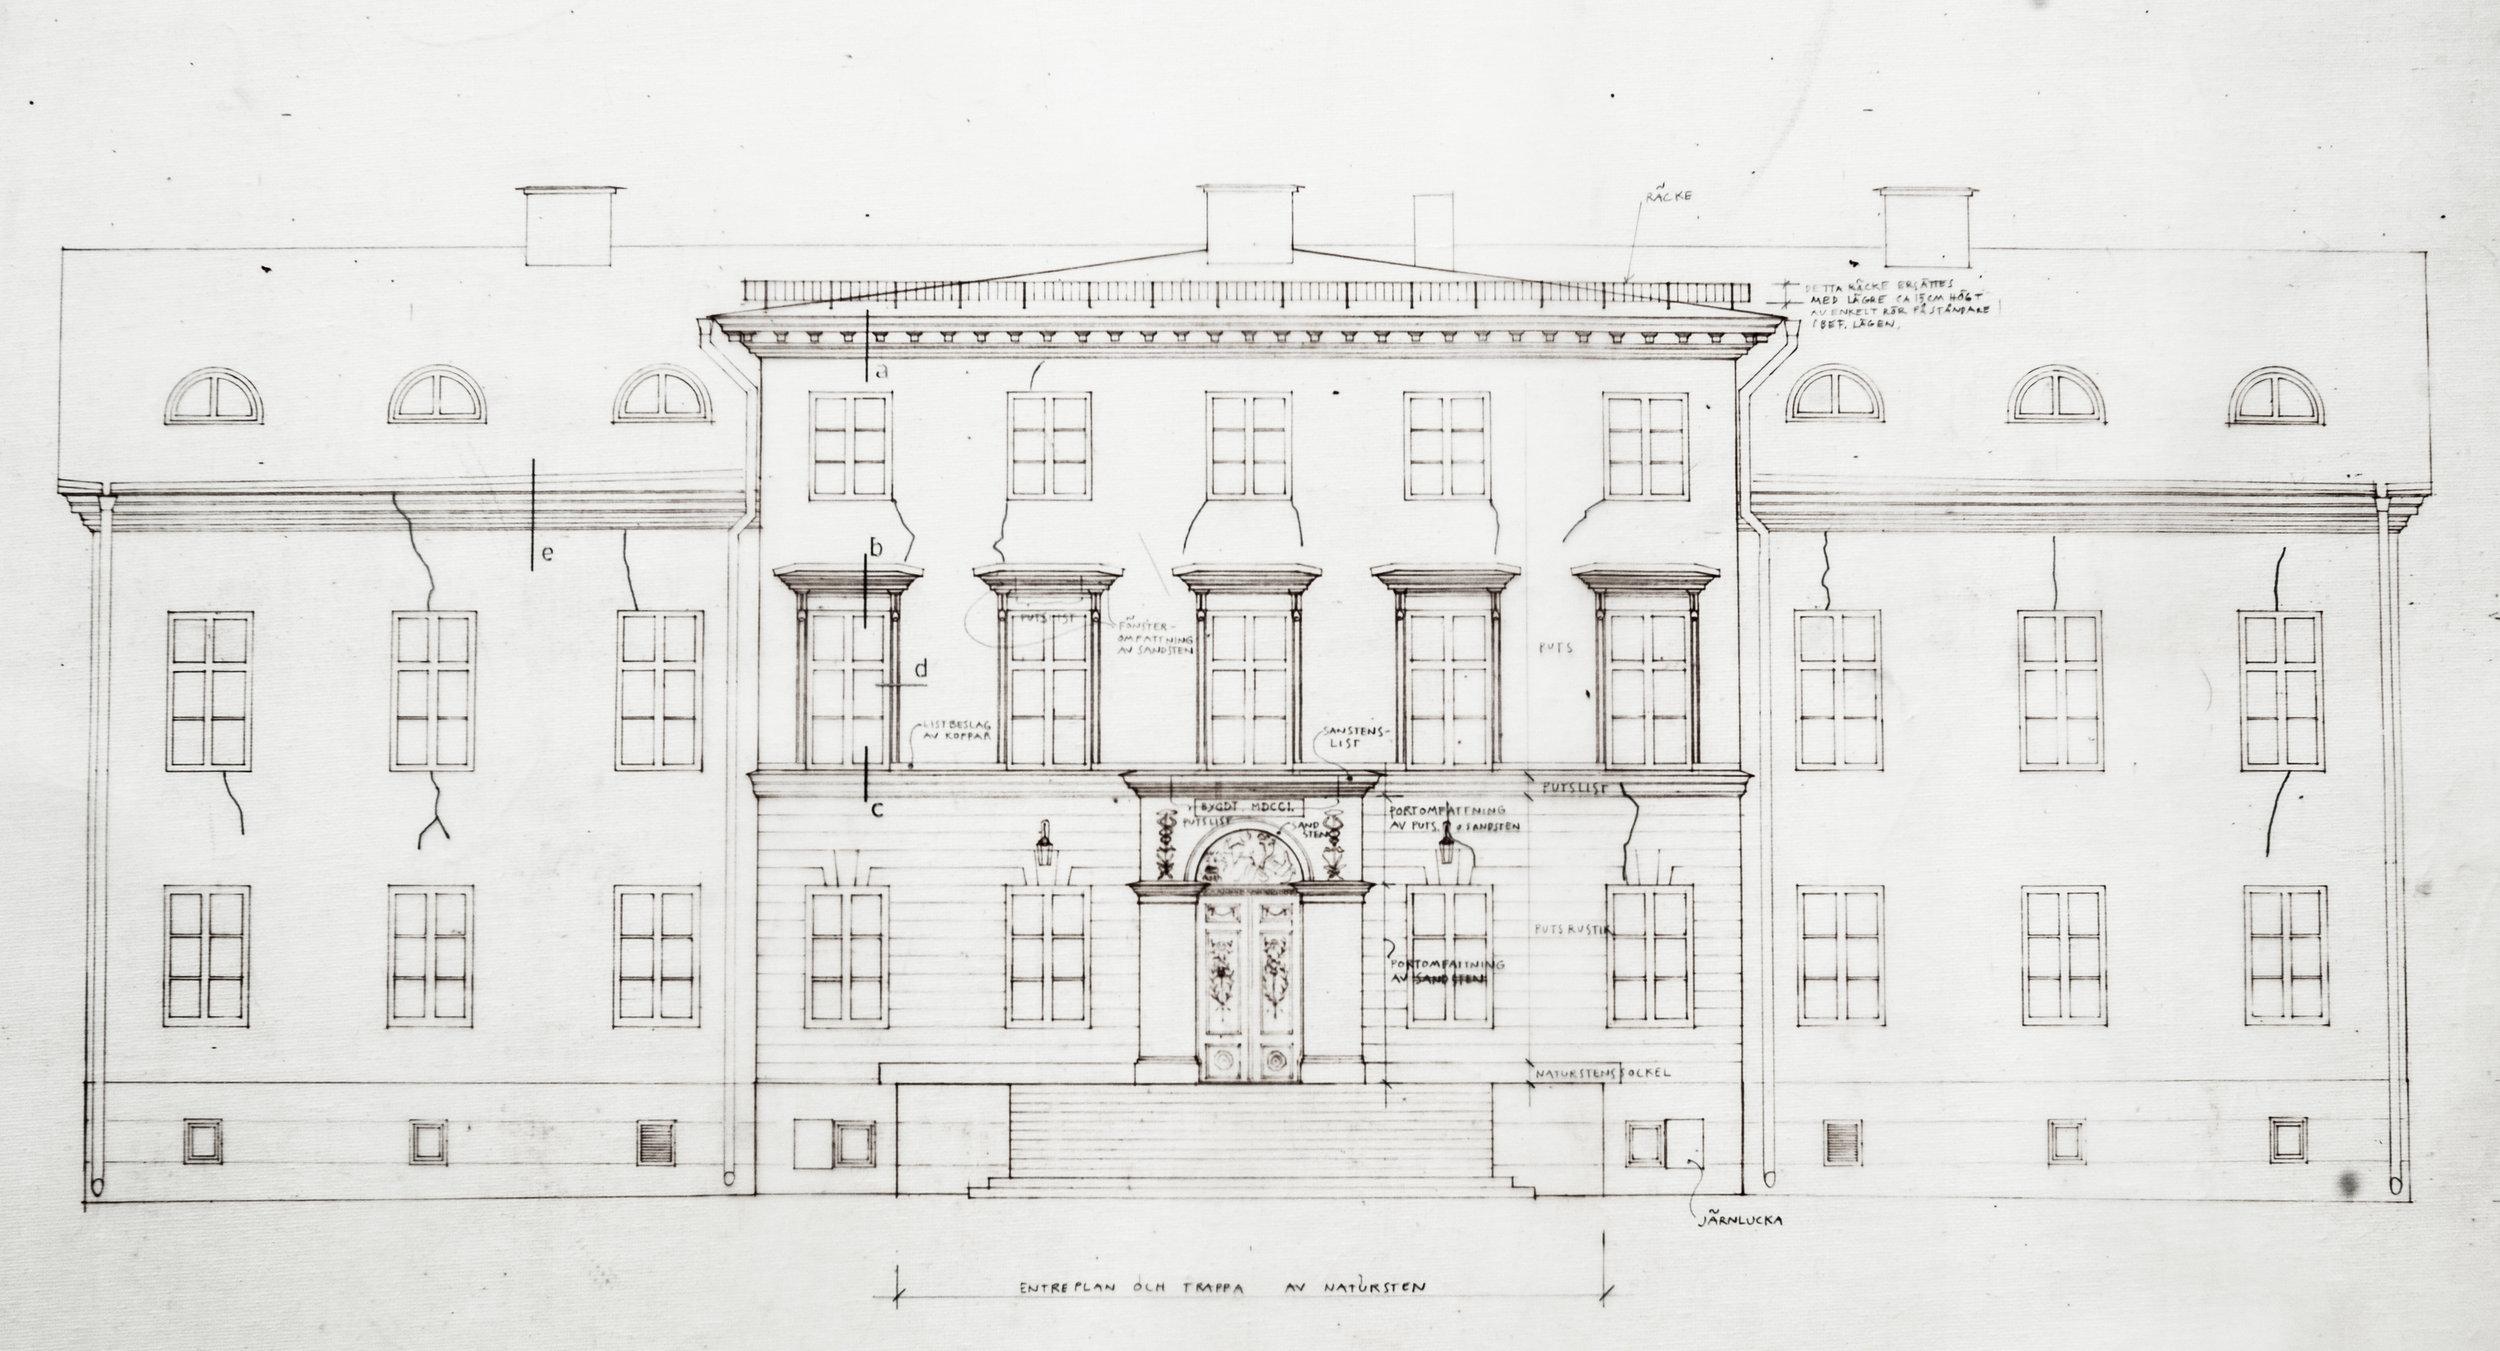 Ritning Garpenbergs Slott Anno 1801